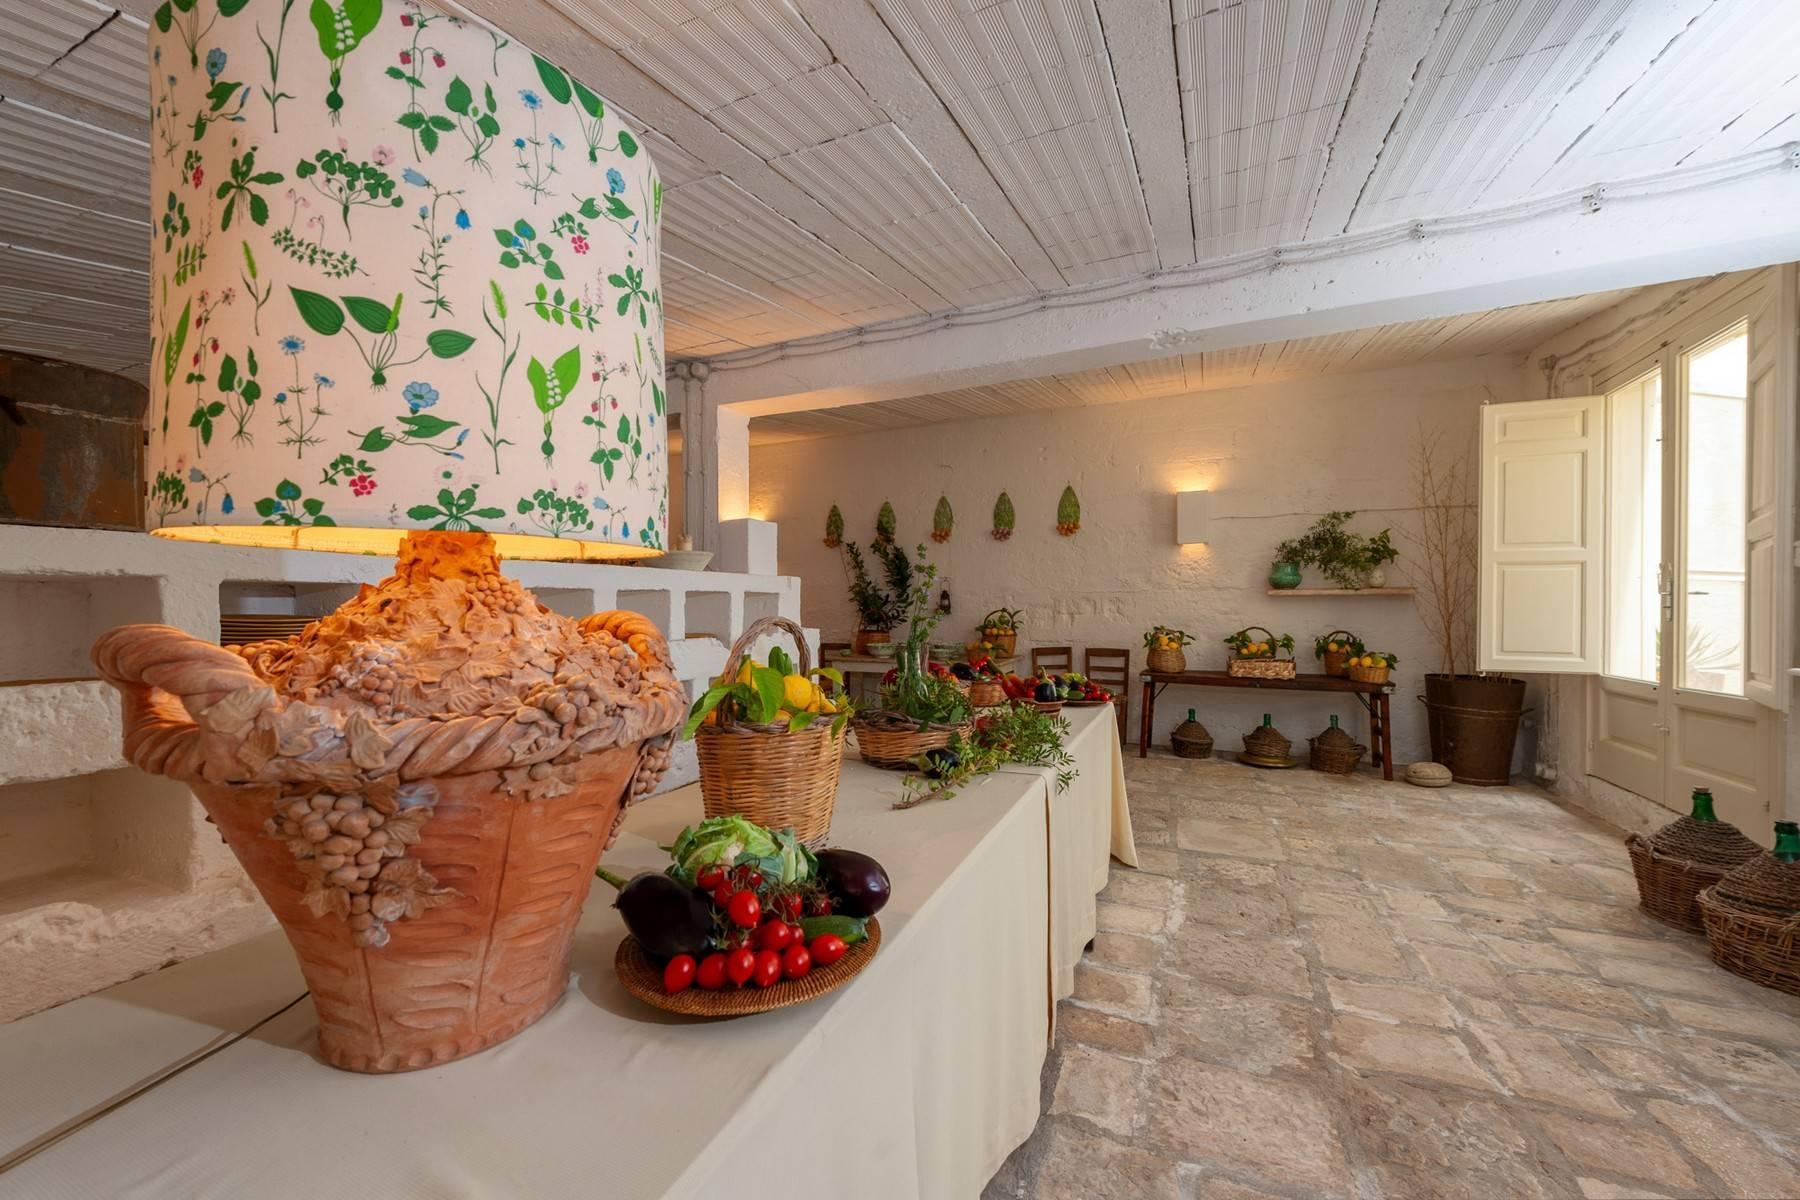 Splendida villa gentilizia del '600 circondata da agrumeti - 15